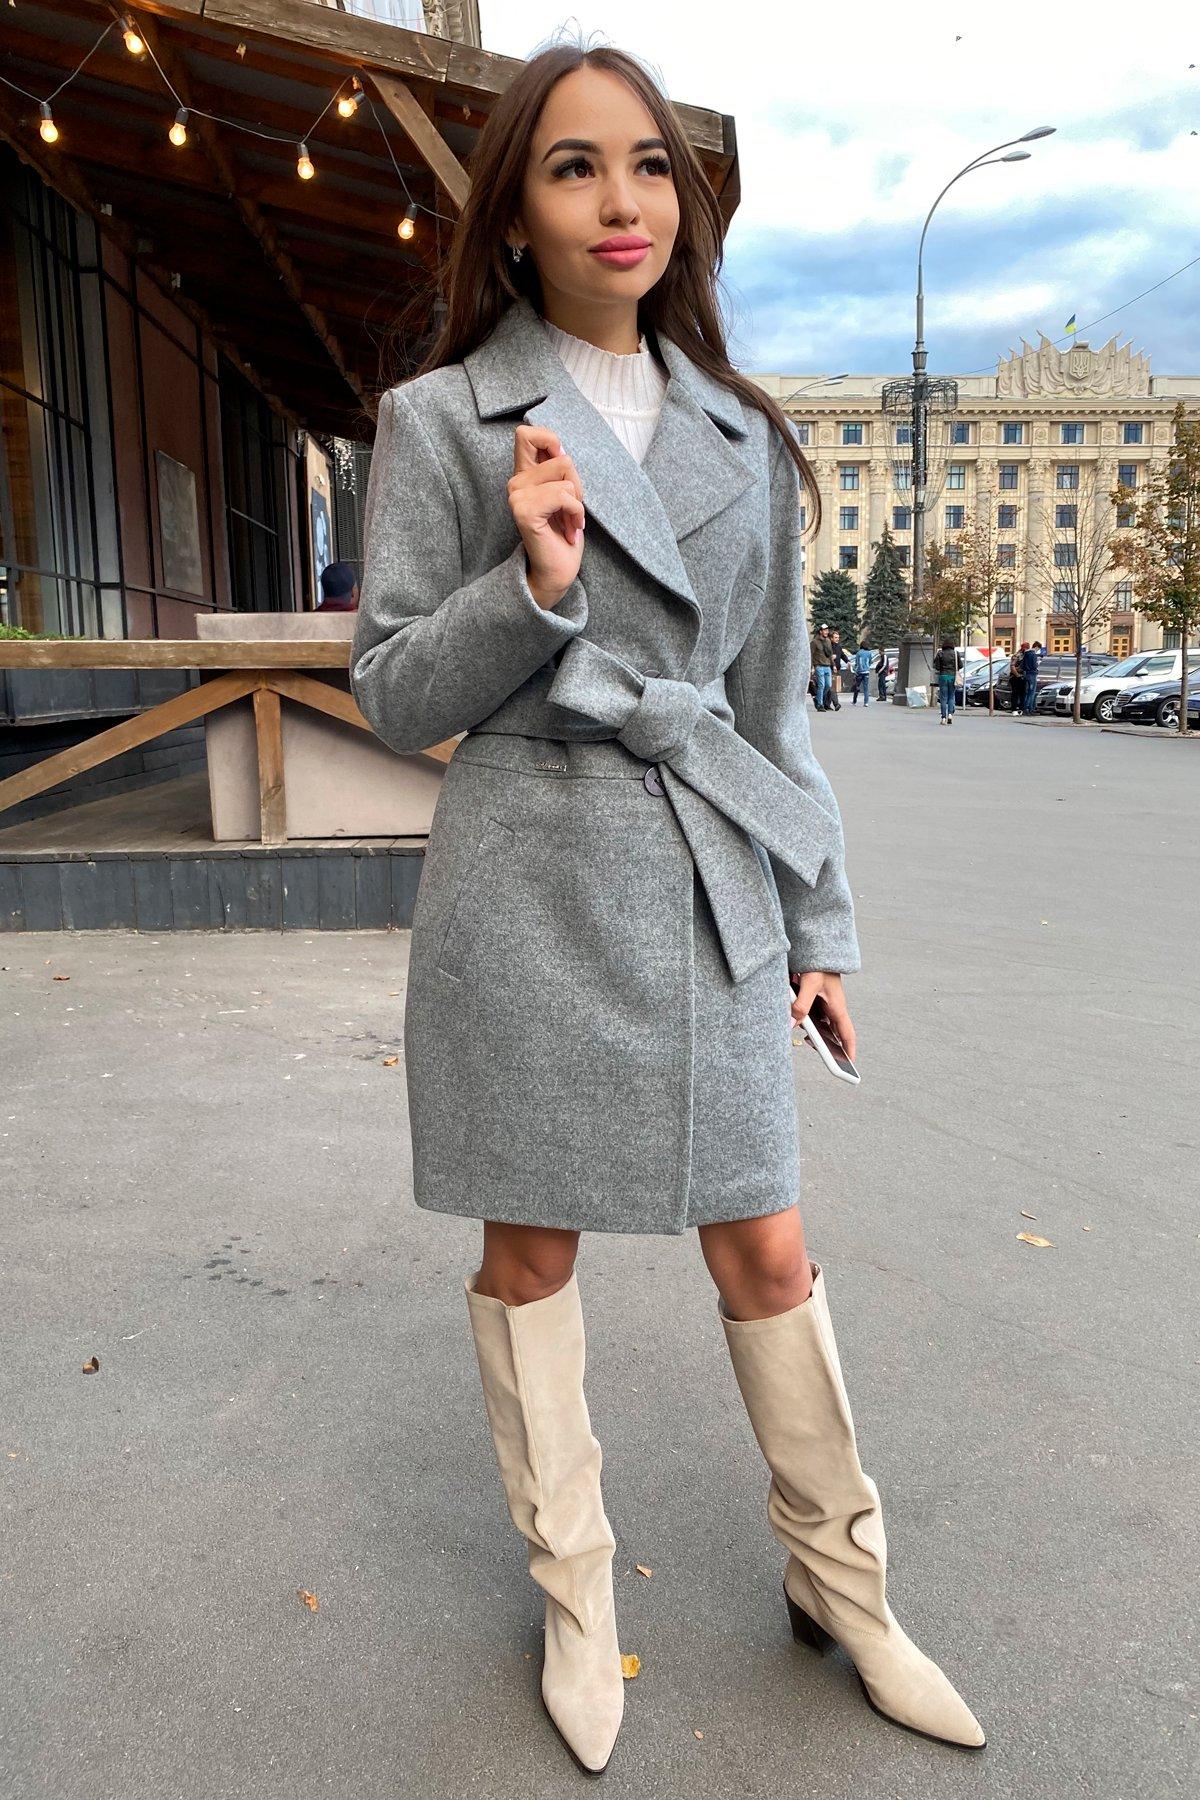 Пальто Габриэлла 7823 АРТ. 43703 Цвет: Серый 1 - фото 4, интернет магазин tm-modus.ru